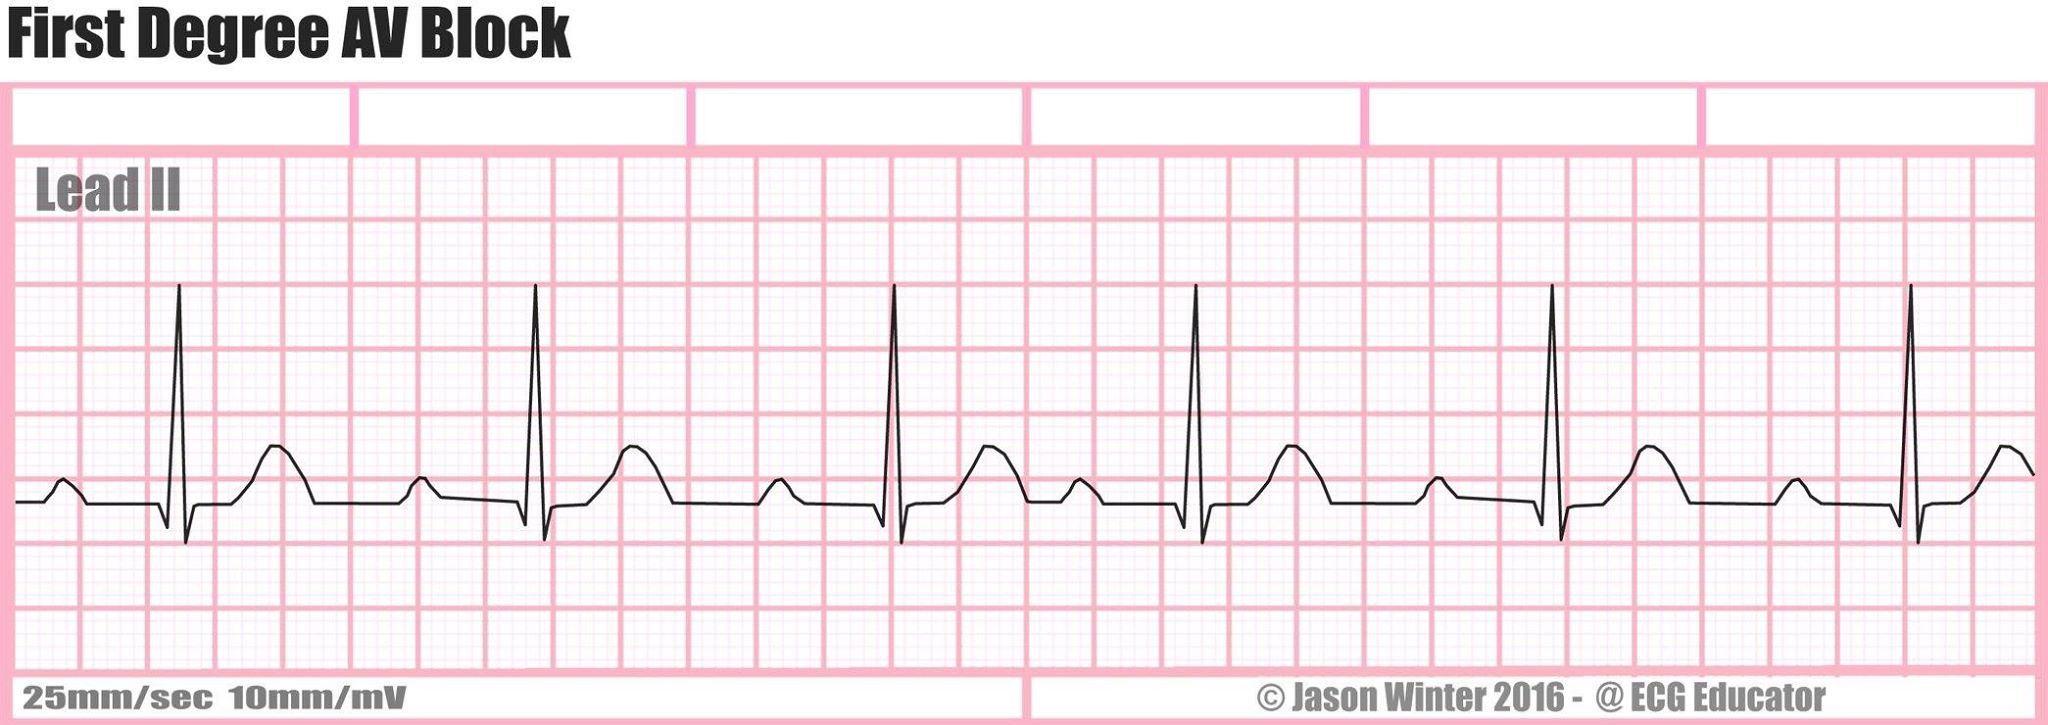 Pin by Jason Winter (ECG Educator). on Six second ECG